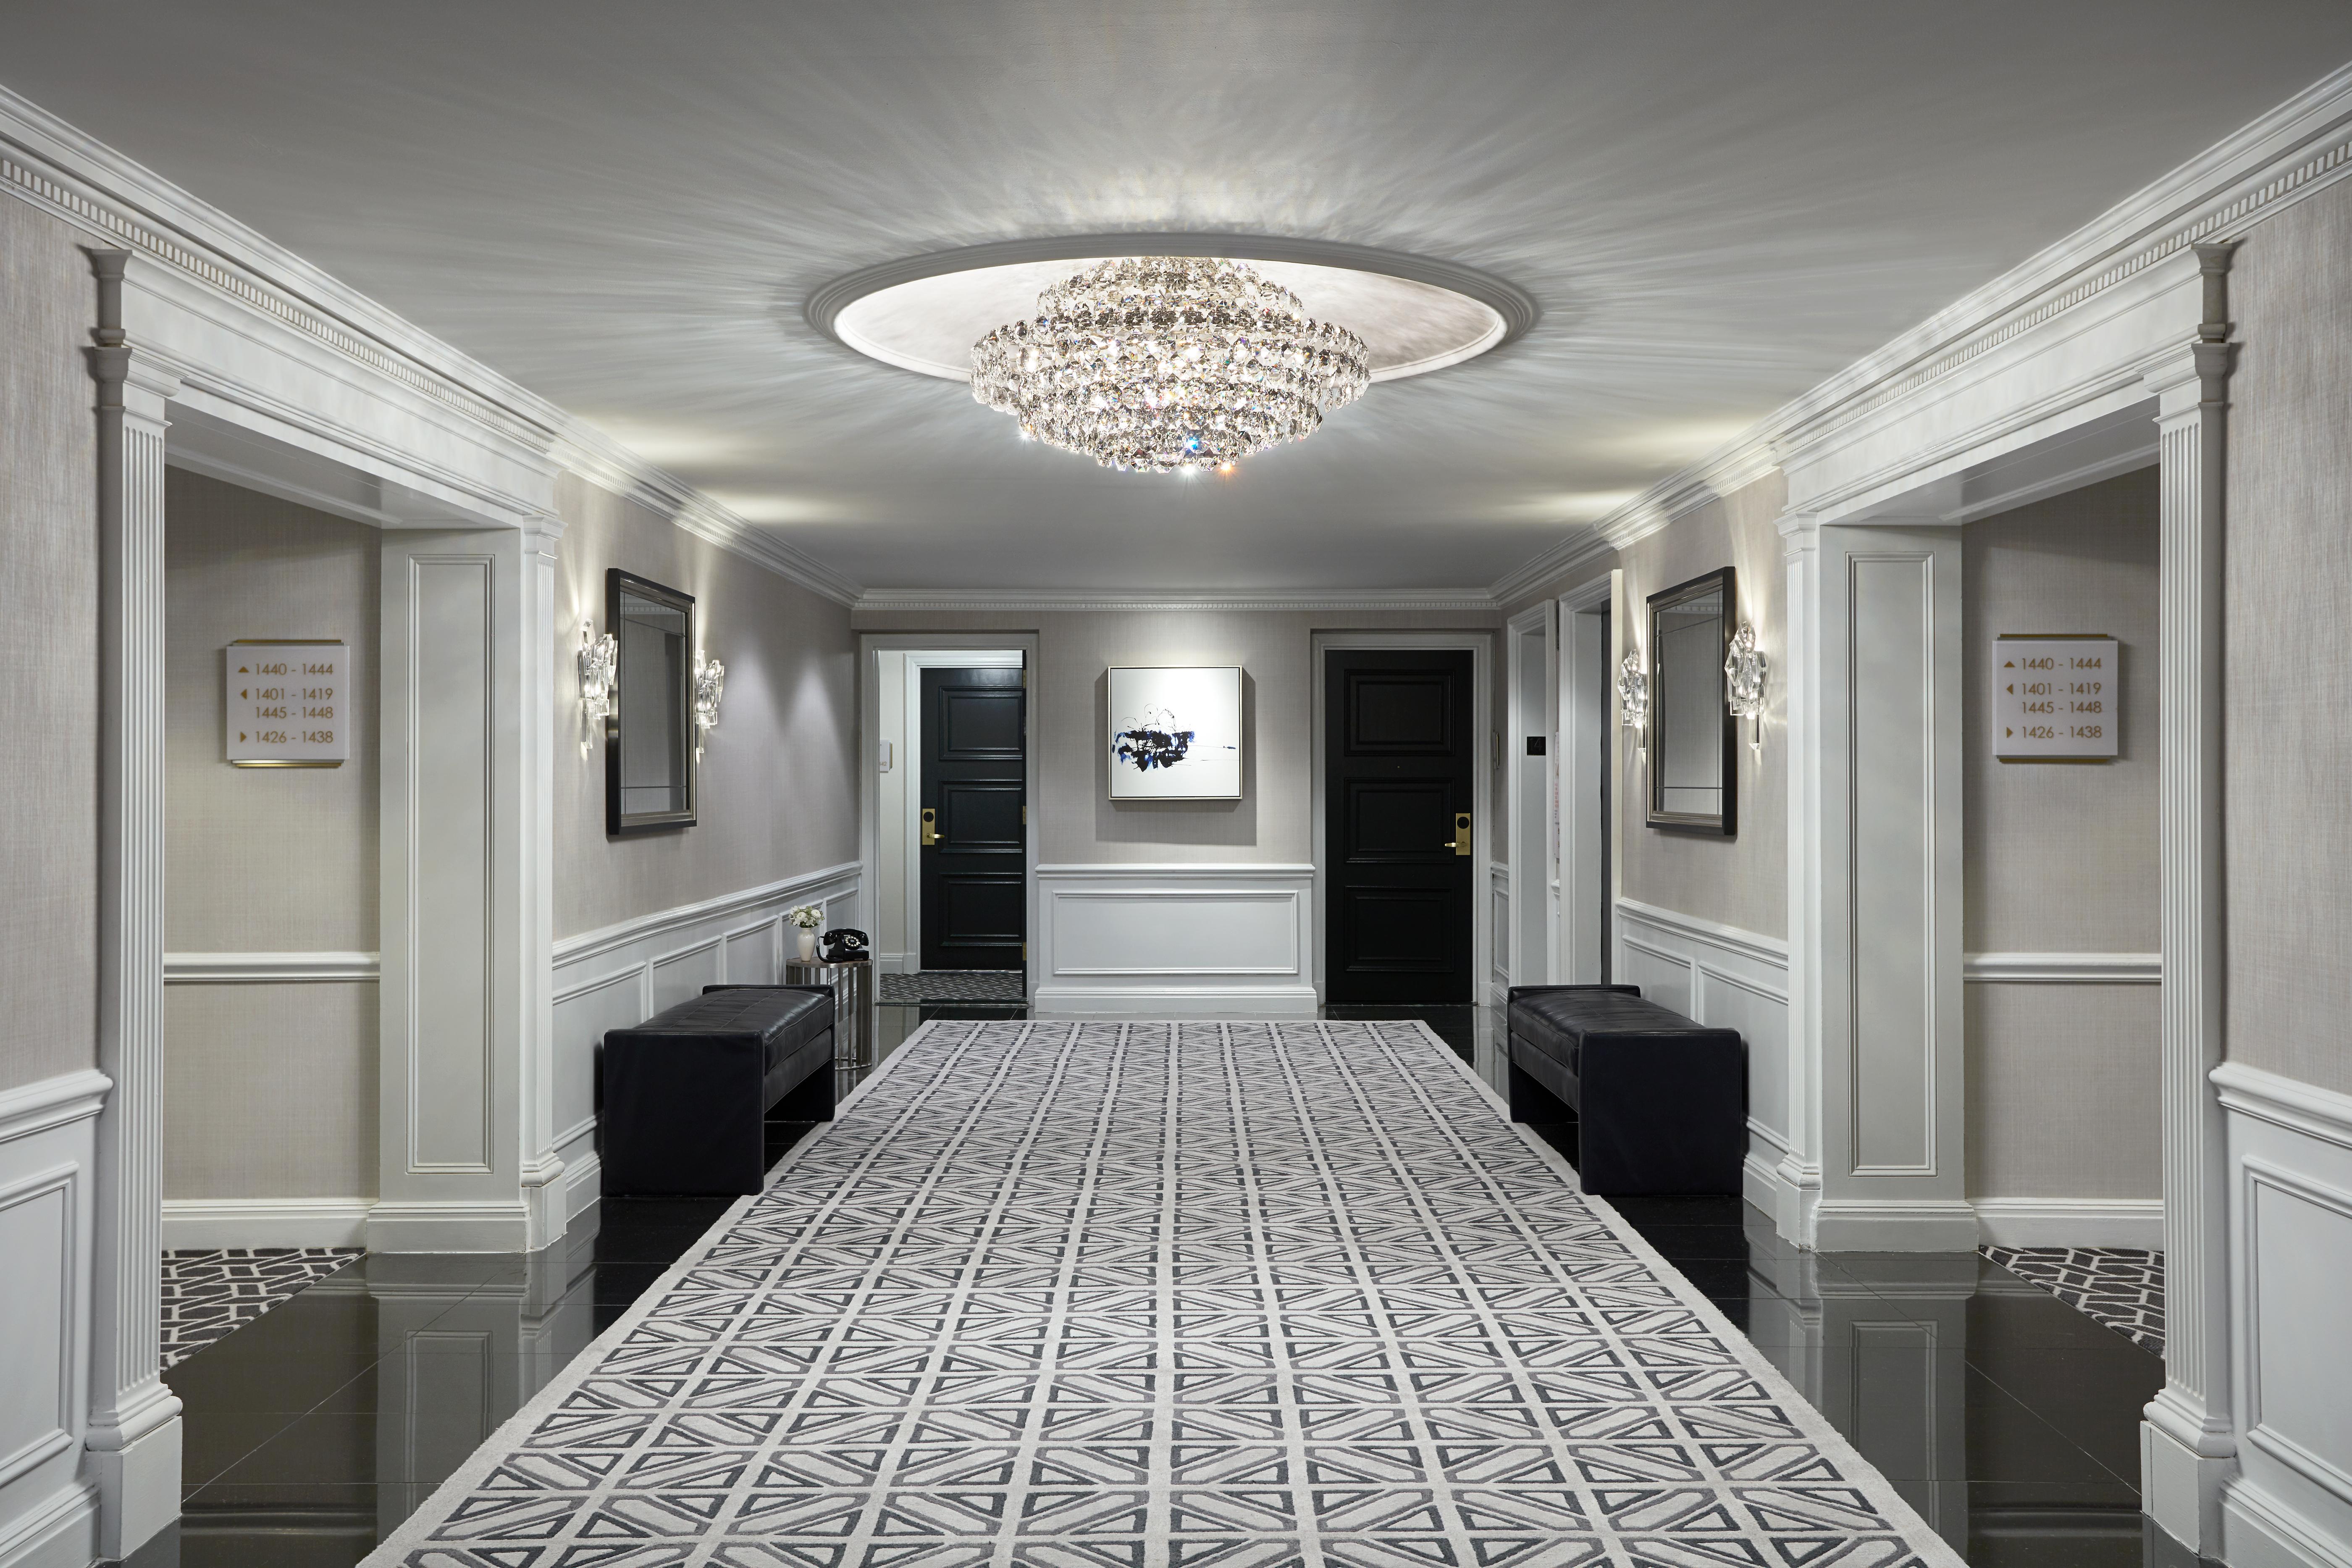 JW Marriott Essex House New York corridor